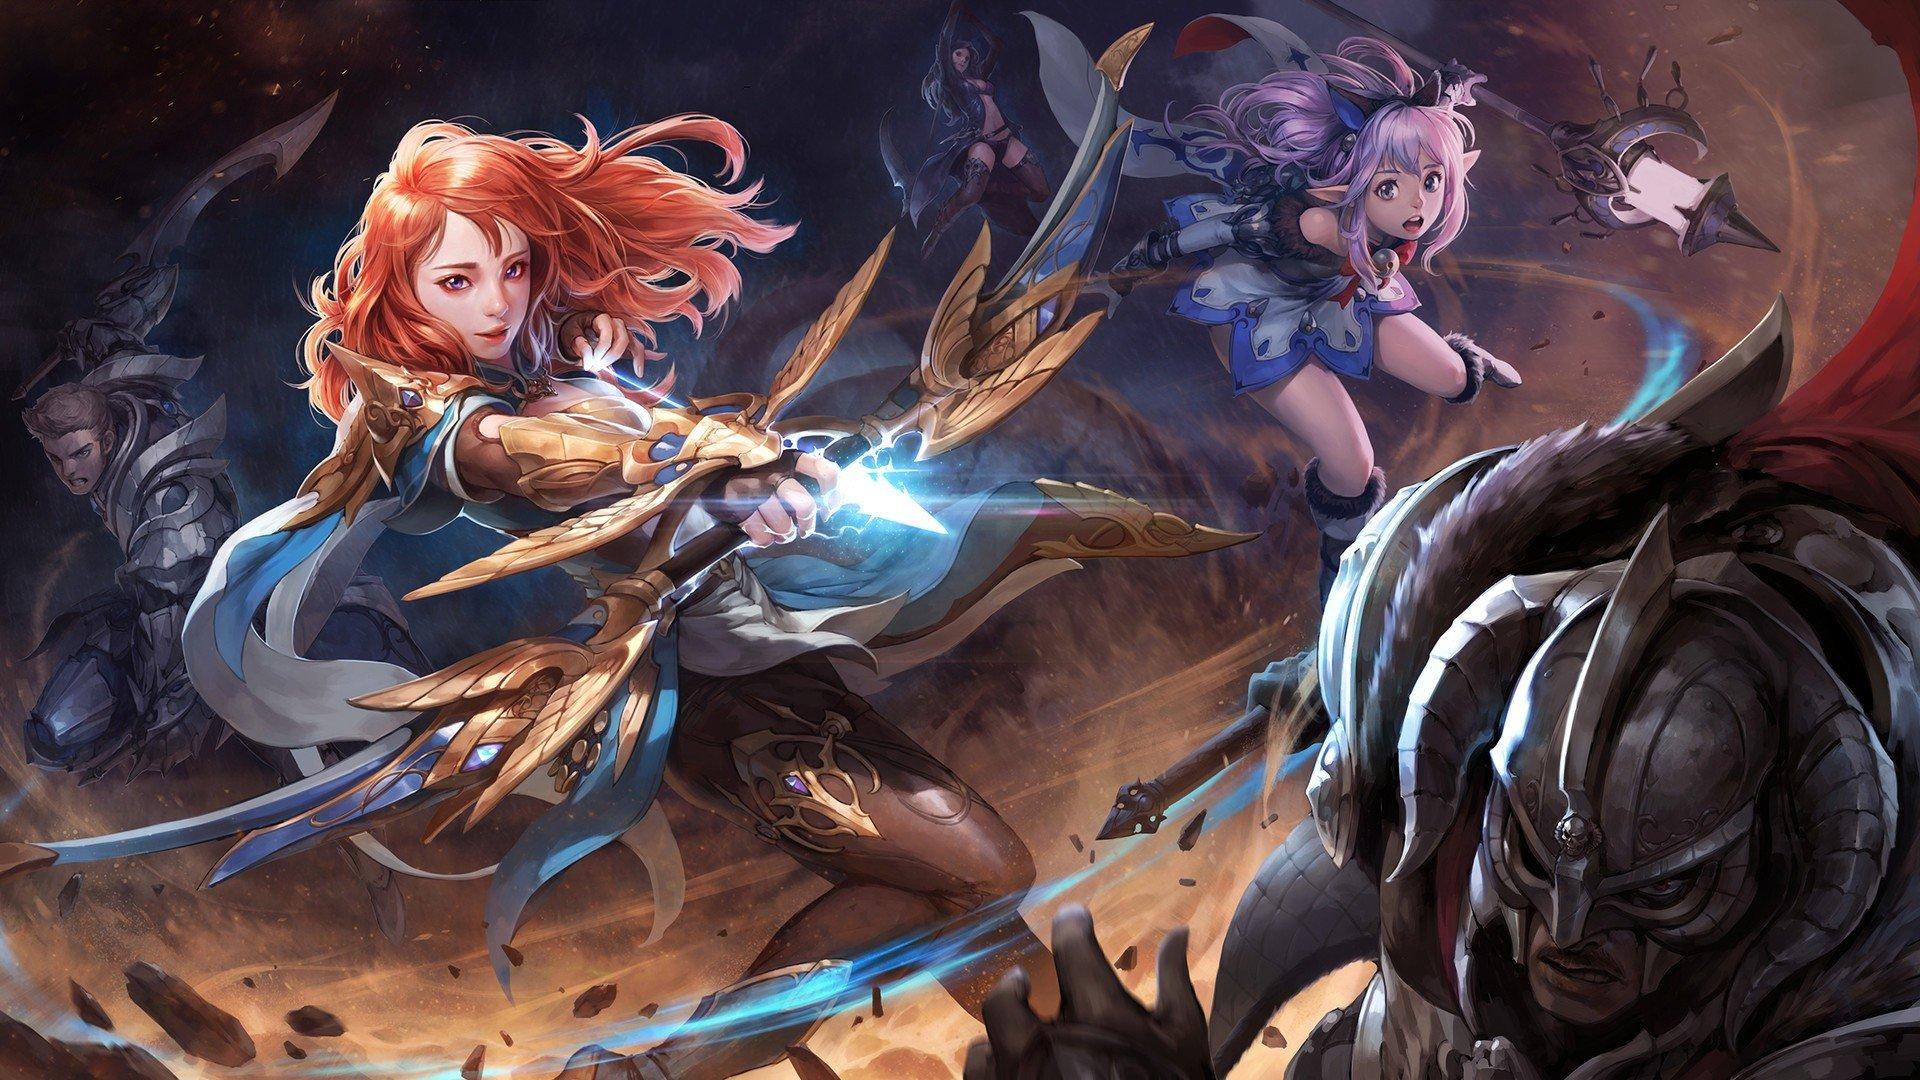 warrior, Archer, Fantasy art Wallpaper